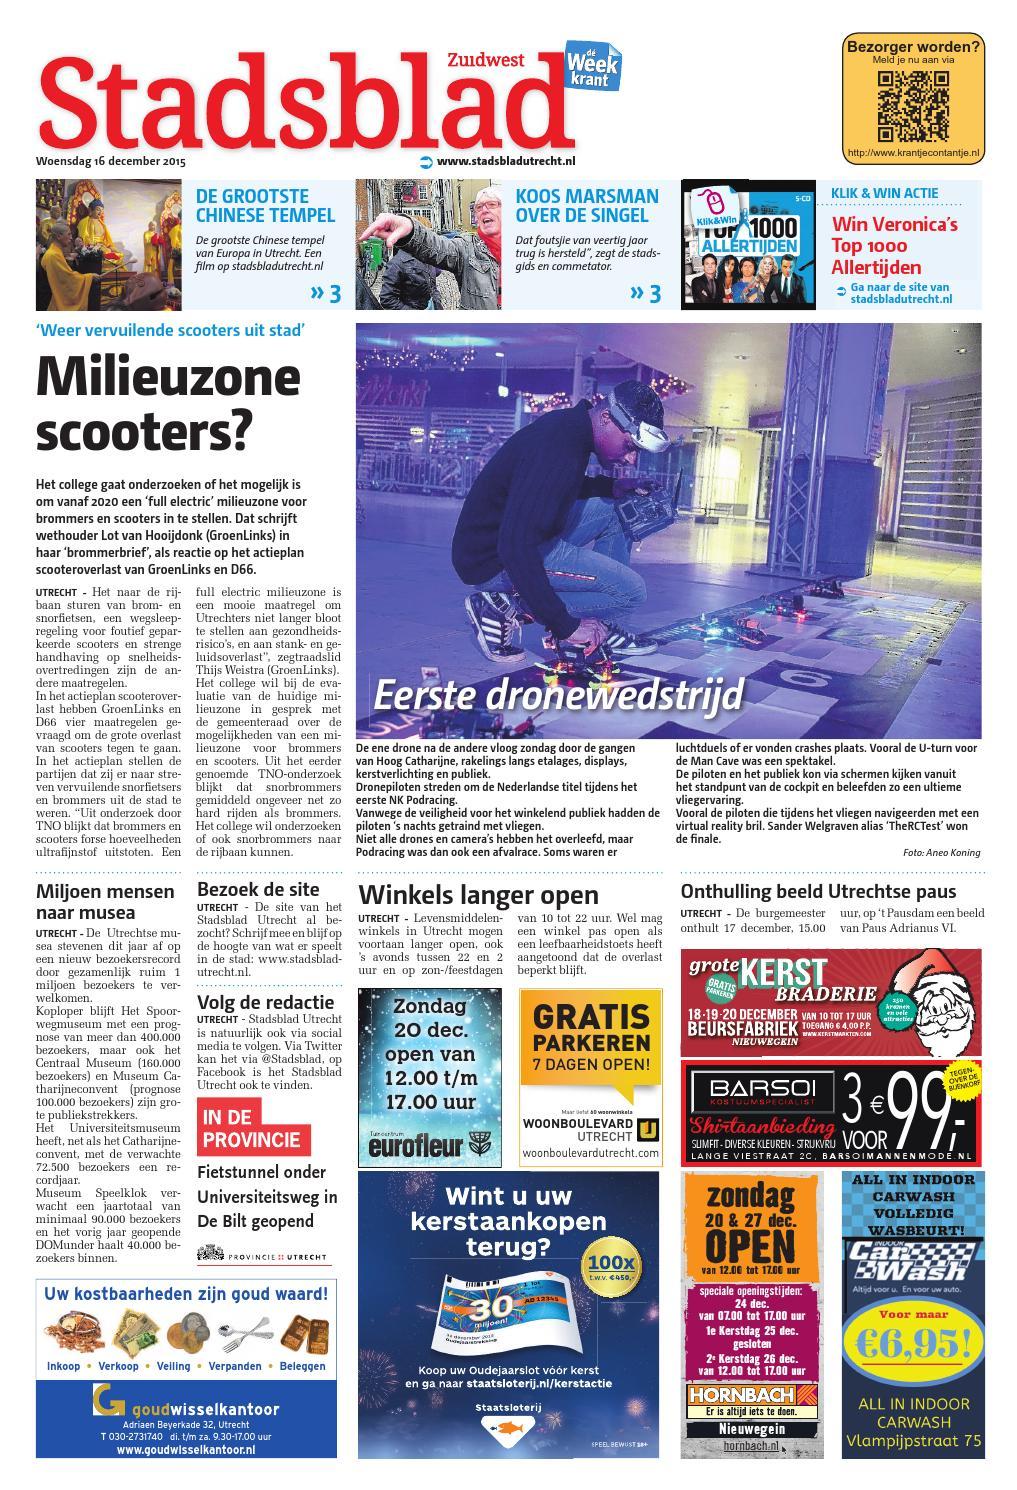 Stadsblad Utrecht week51 by Wegener - issuu 34cd4bae91